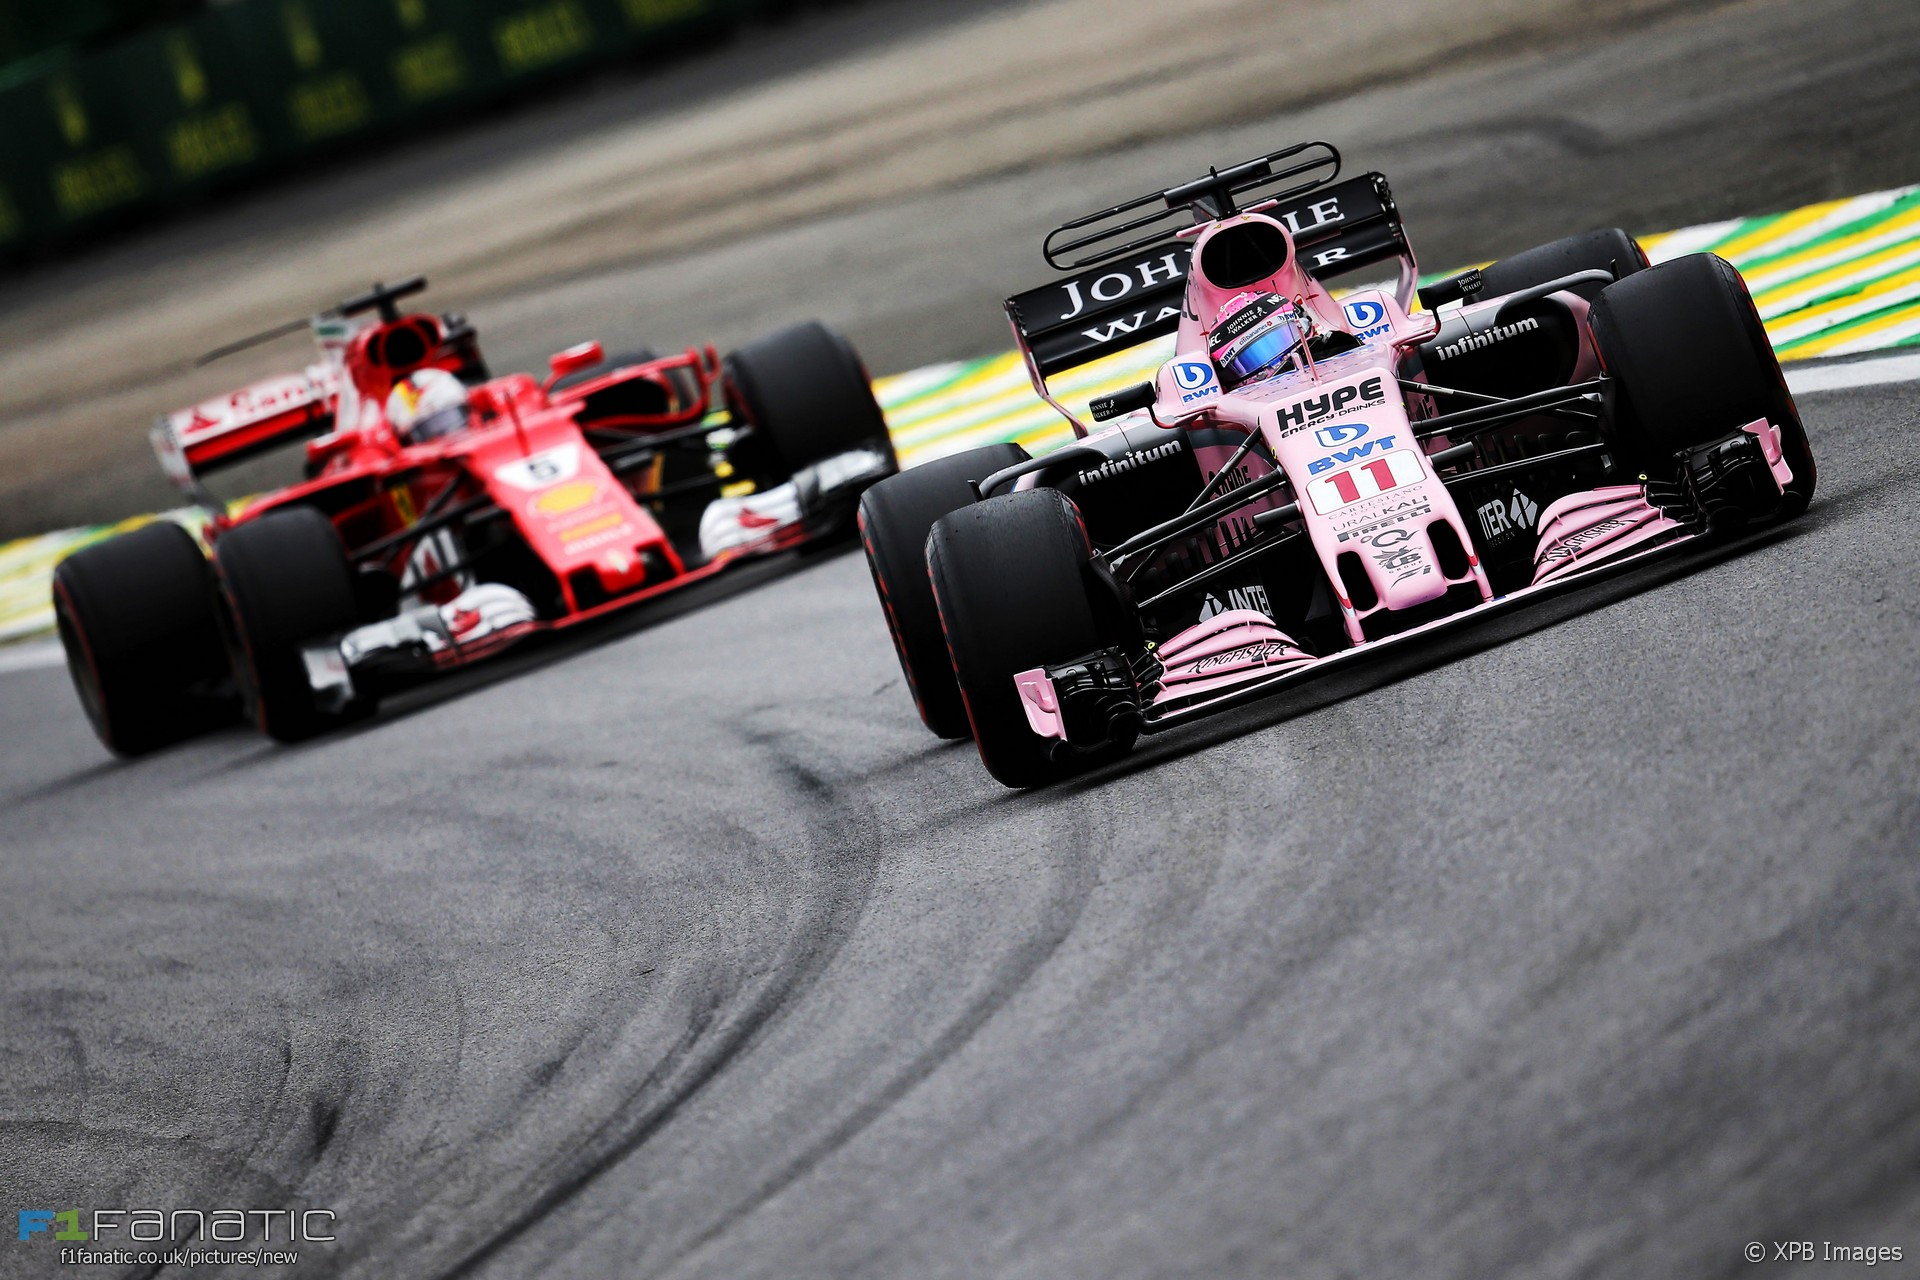 Sergio Perez, Force India, Interlagos, 2017